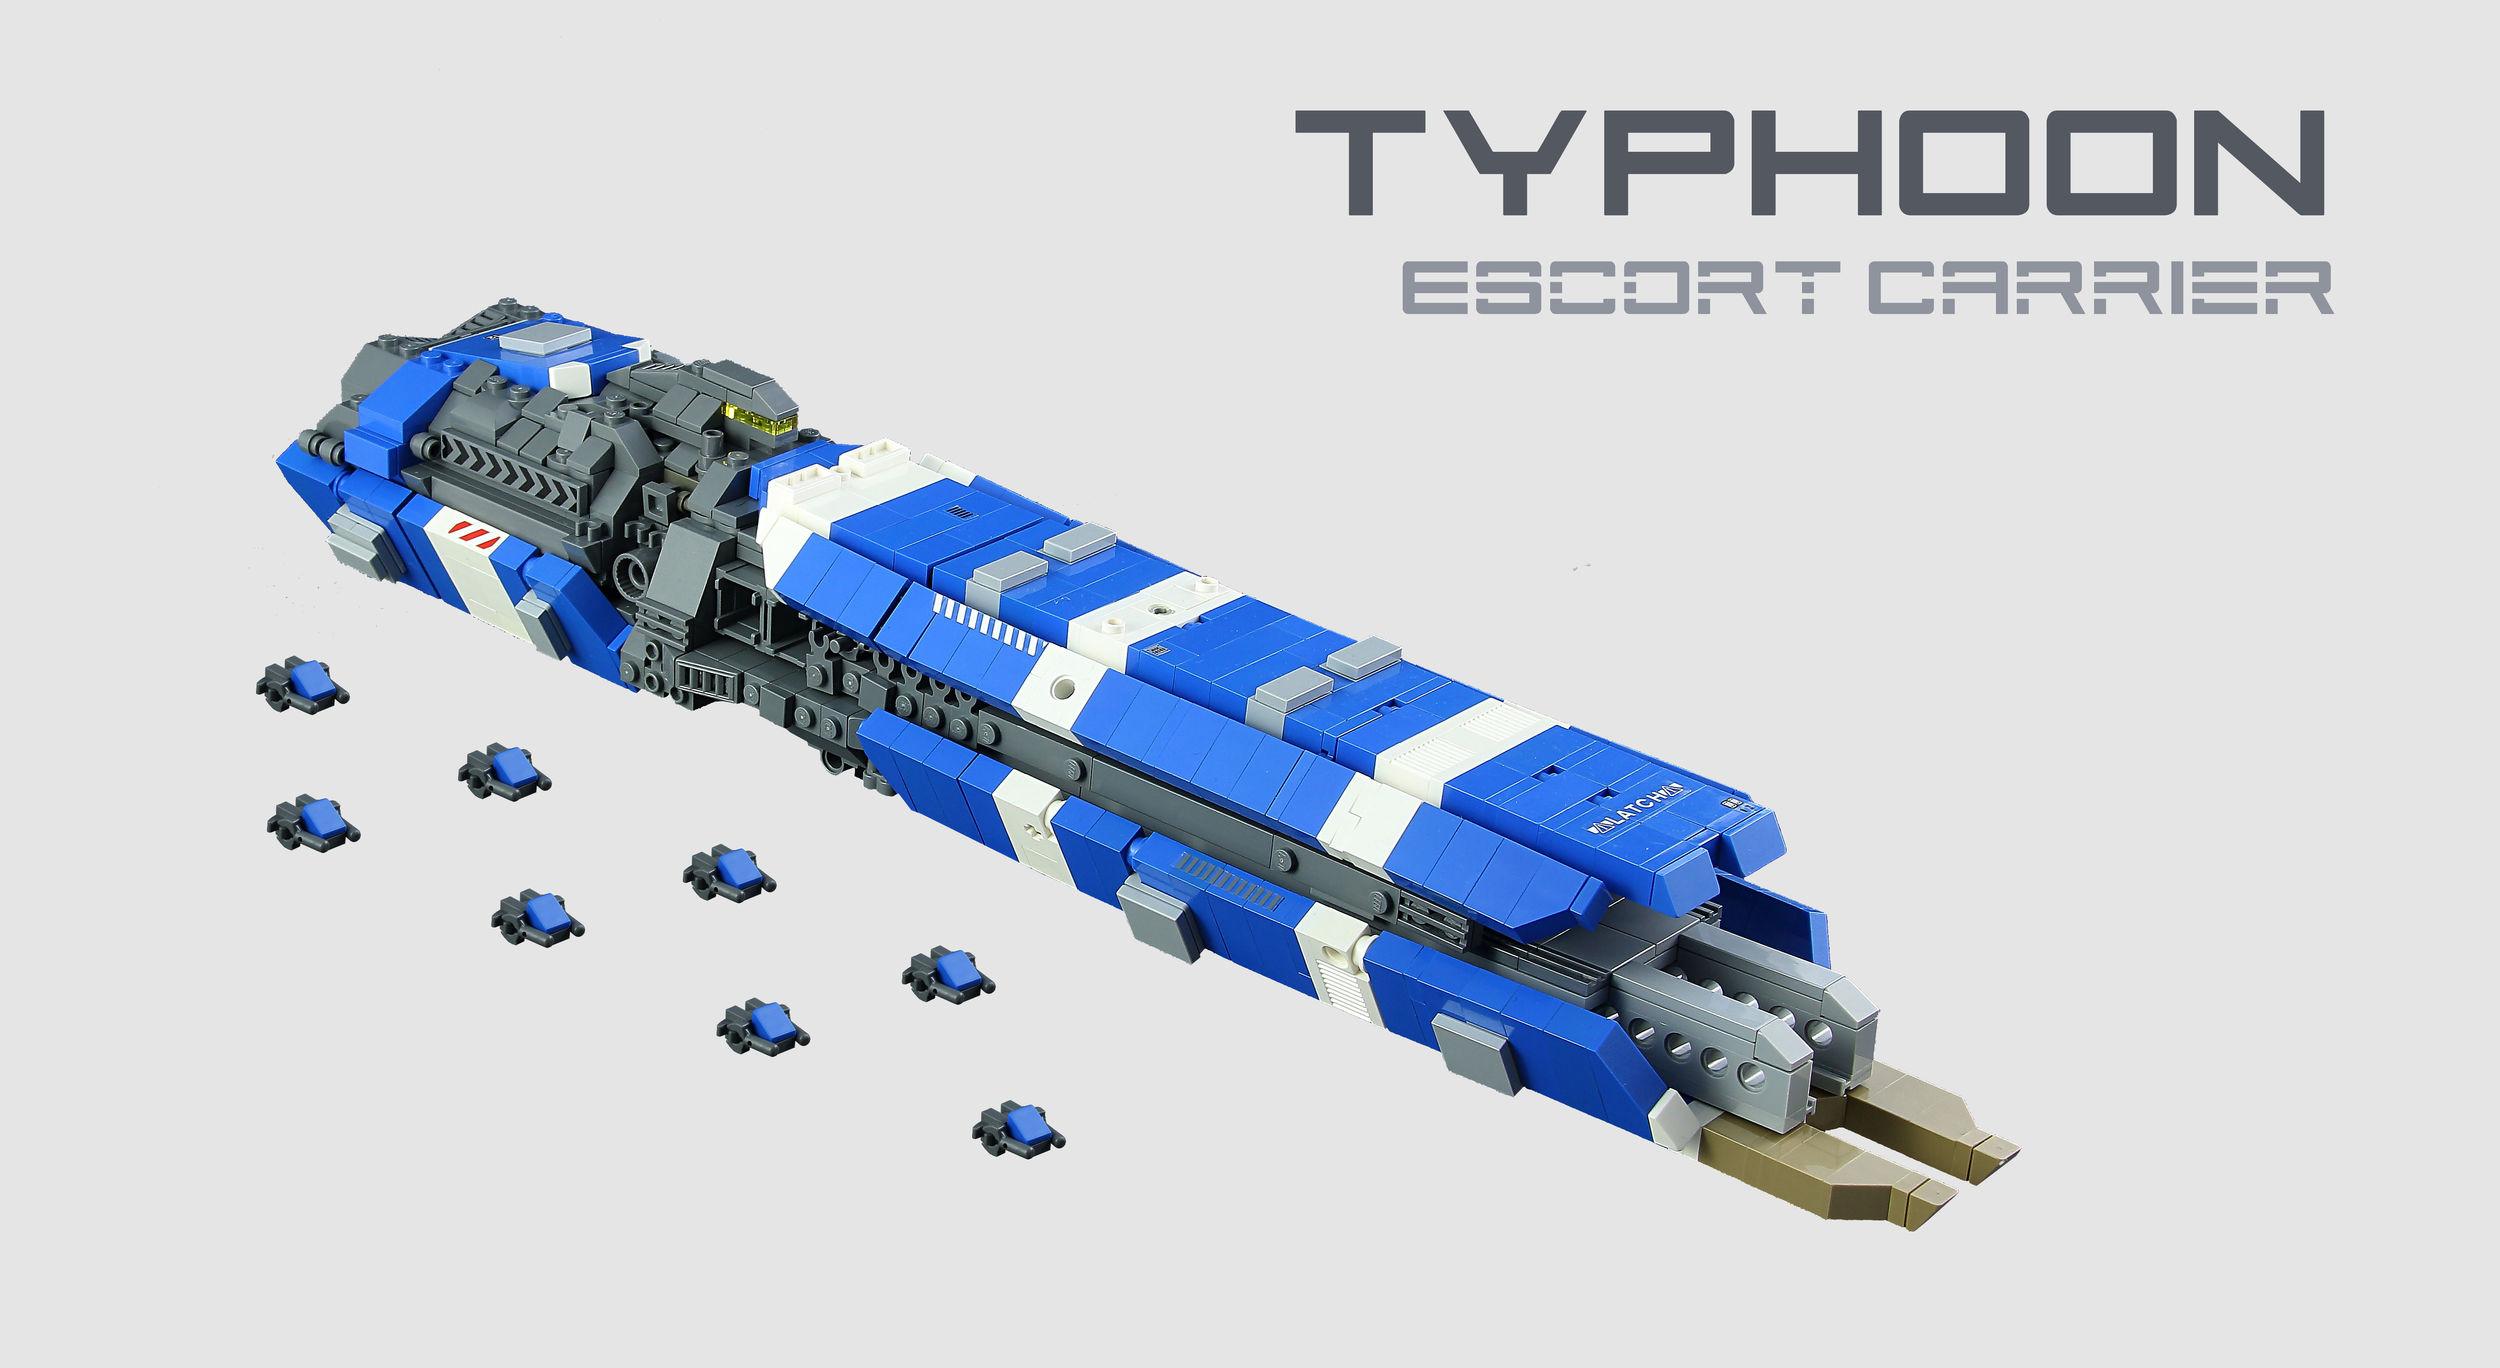 Typhoom Escort Carrier 2.jpg